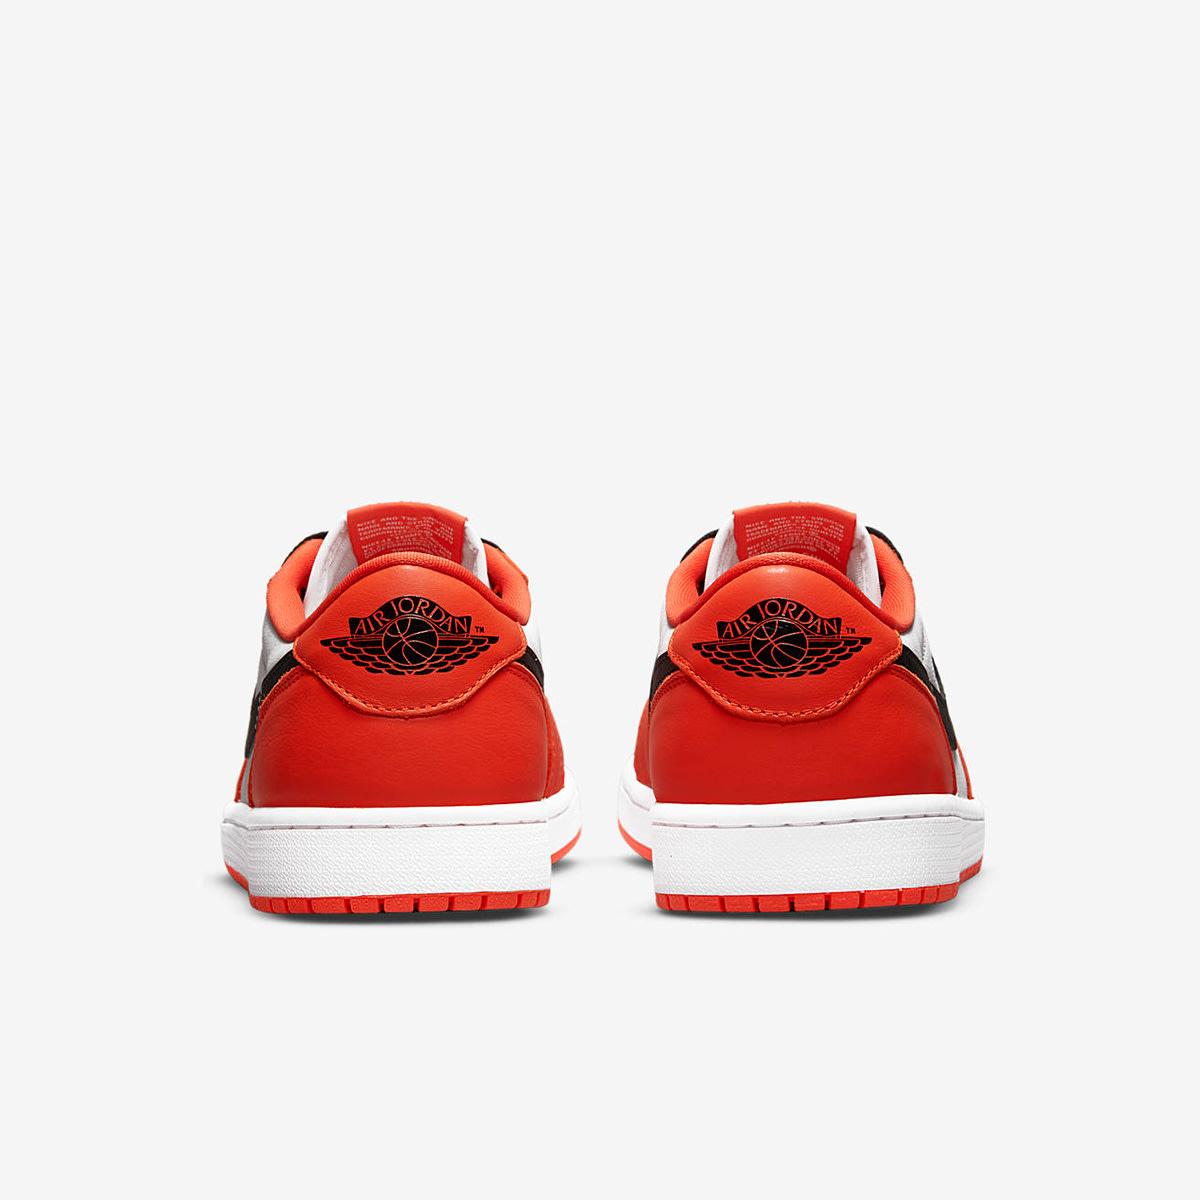 "Air Jordan 1 Low OG ""Shattered Backboard"" - CZ0790-801"